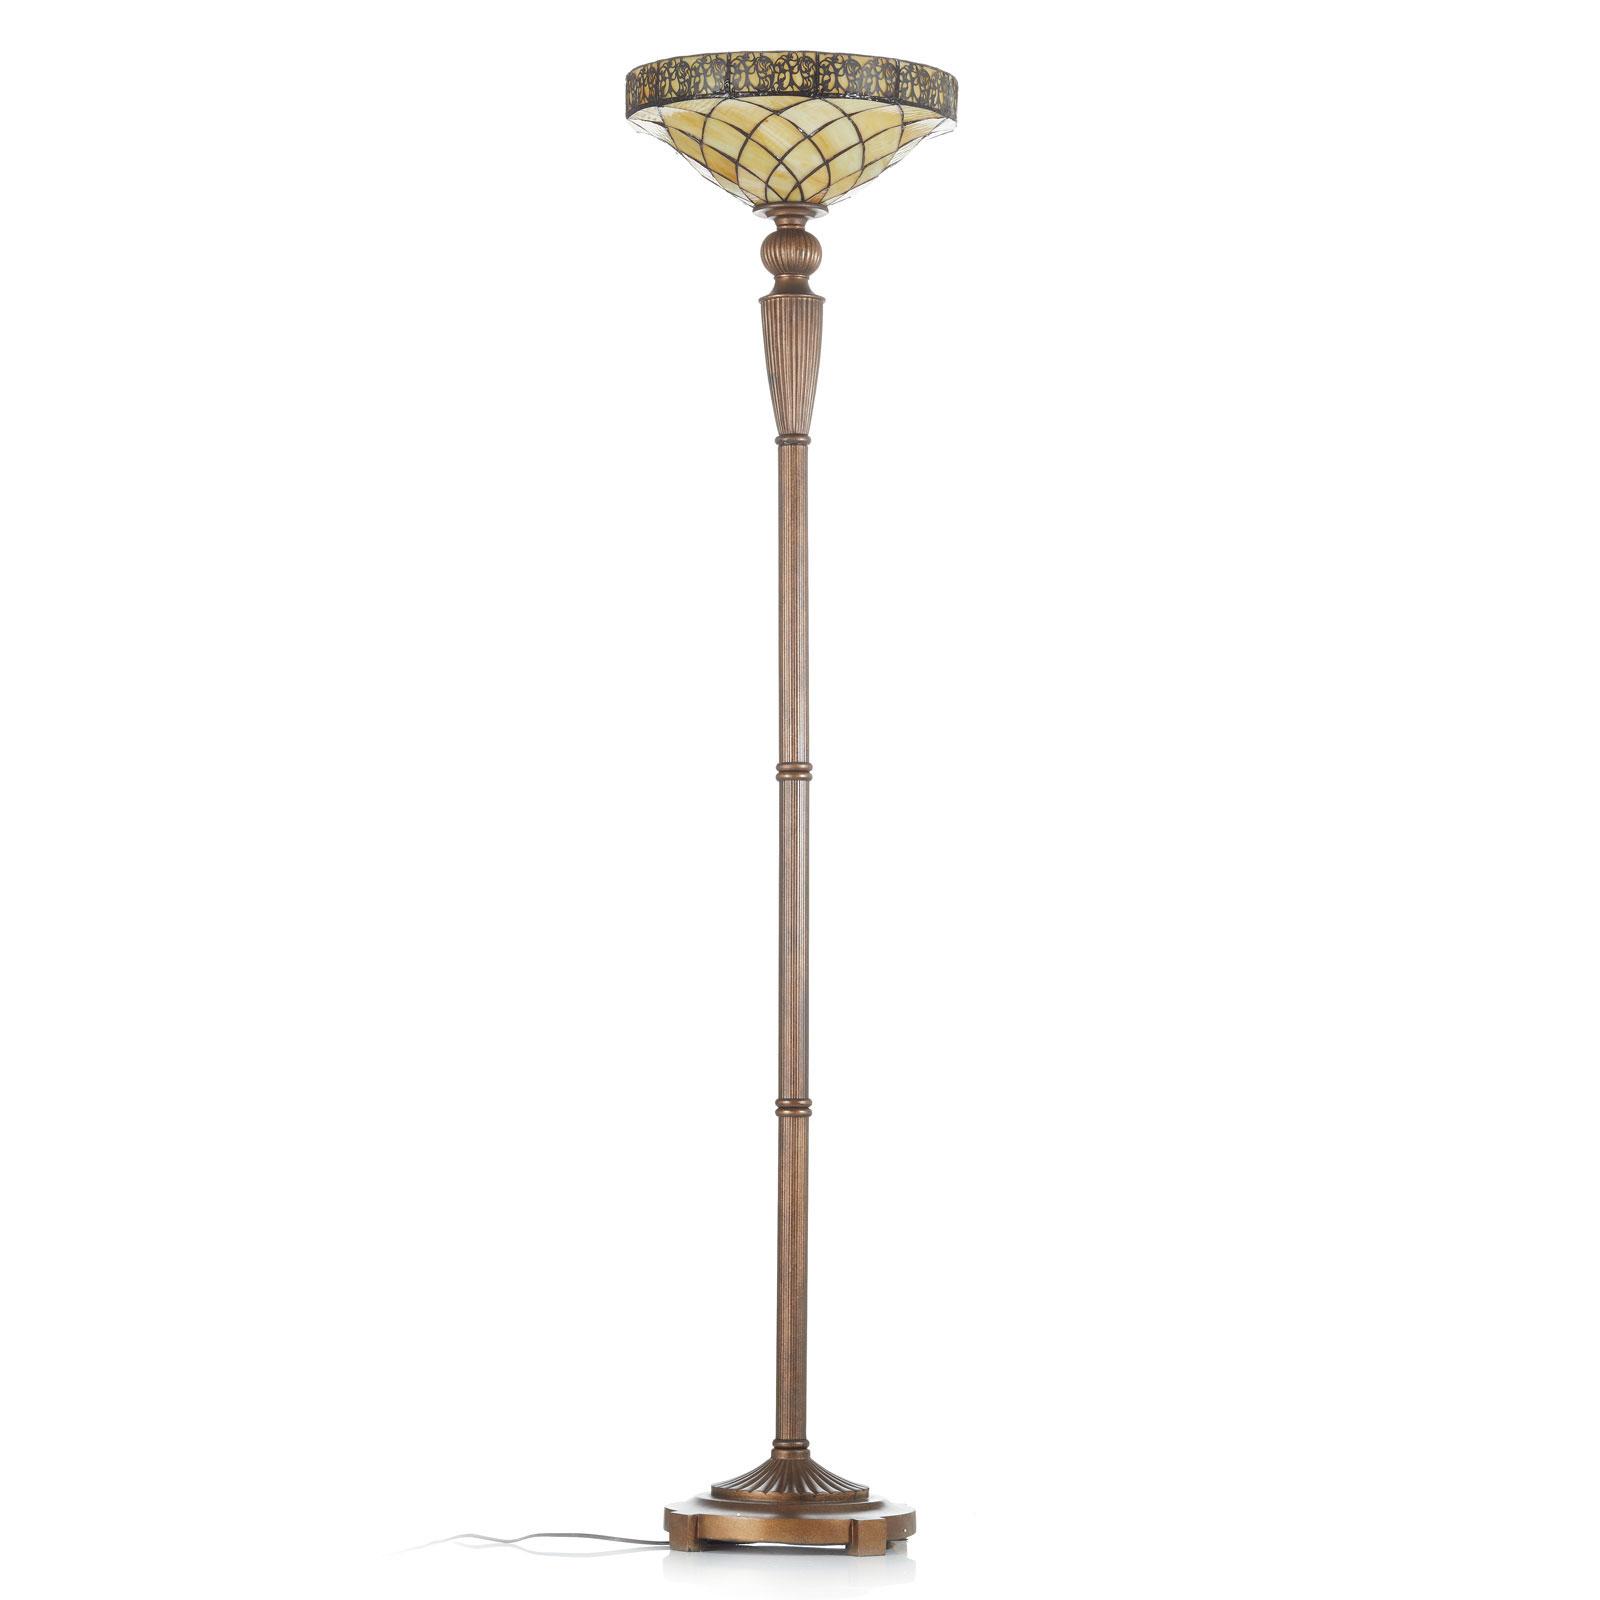 Uplight-lampe Diamond i Tiffany-stil